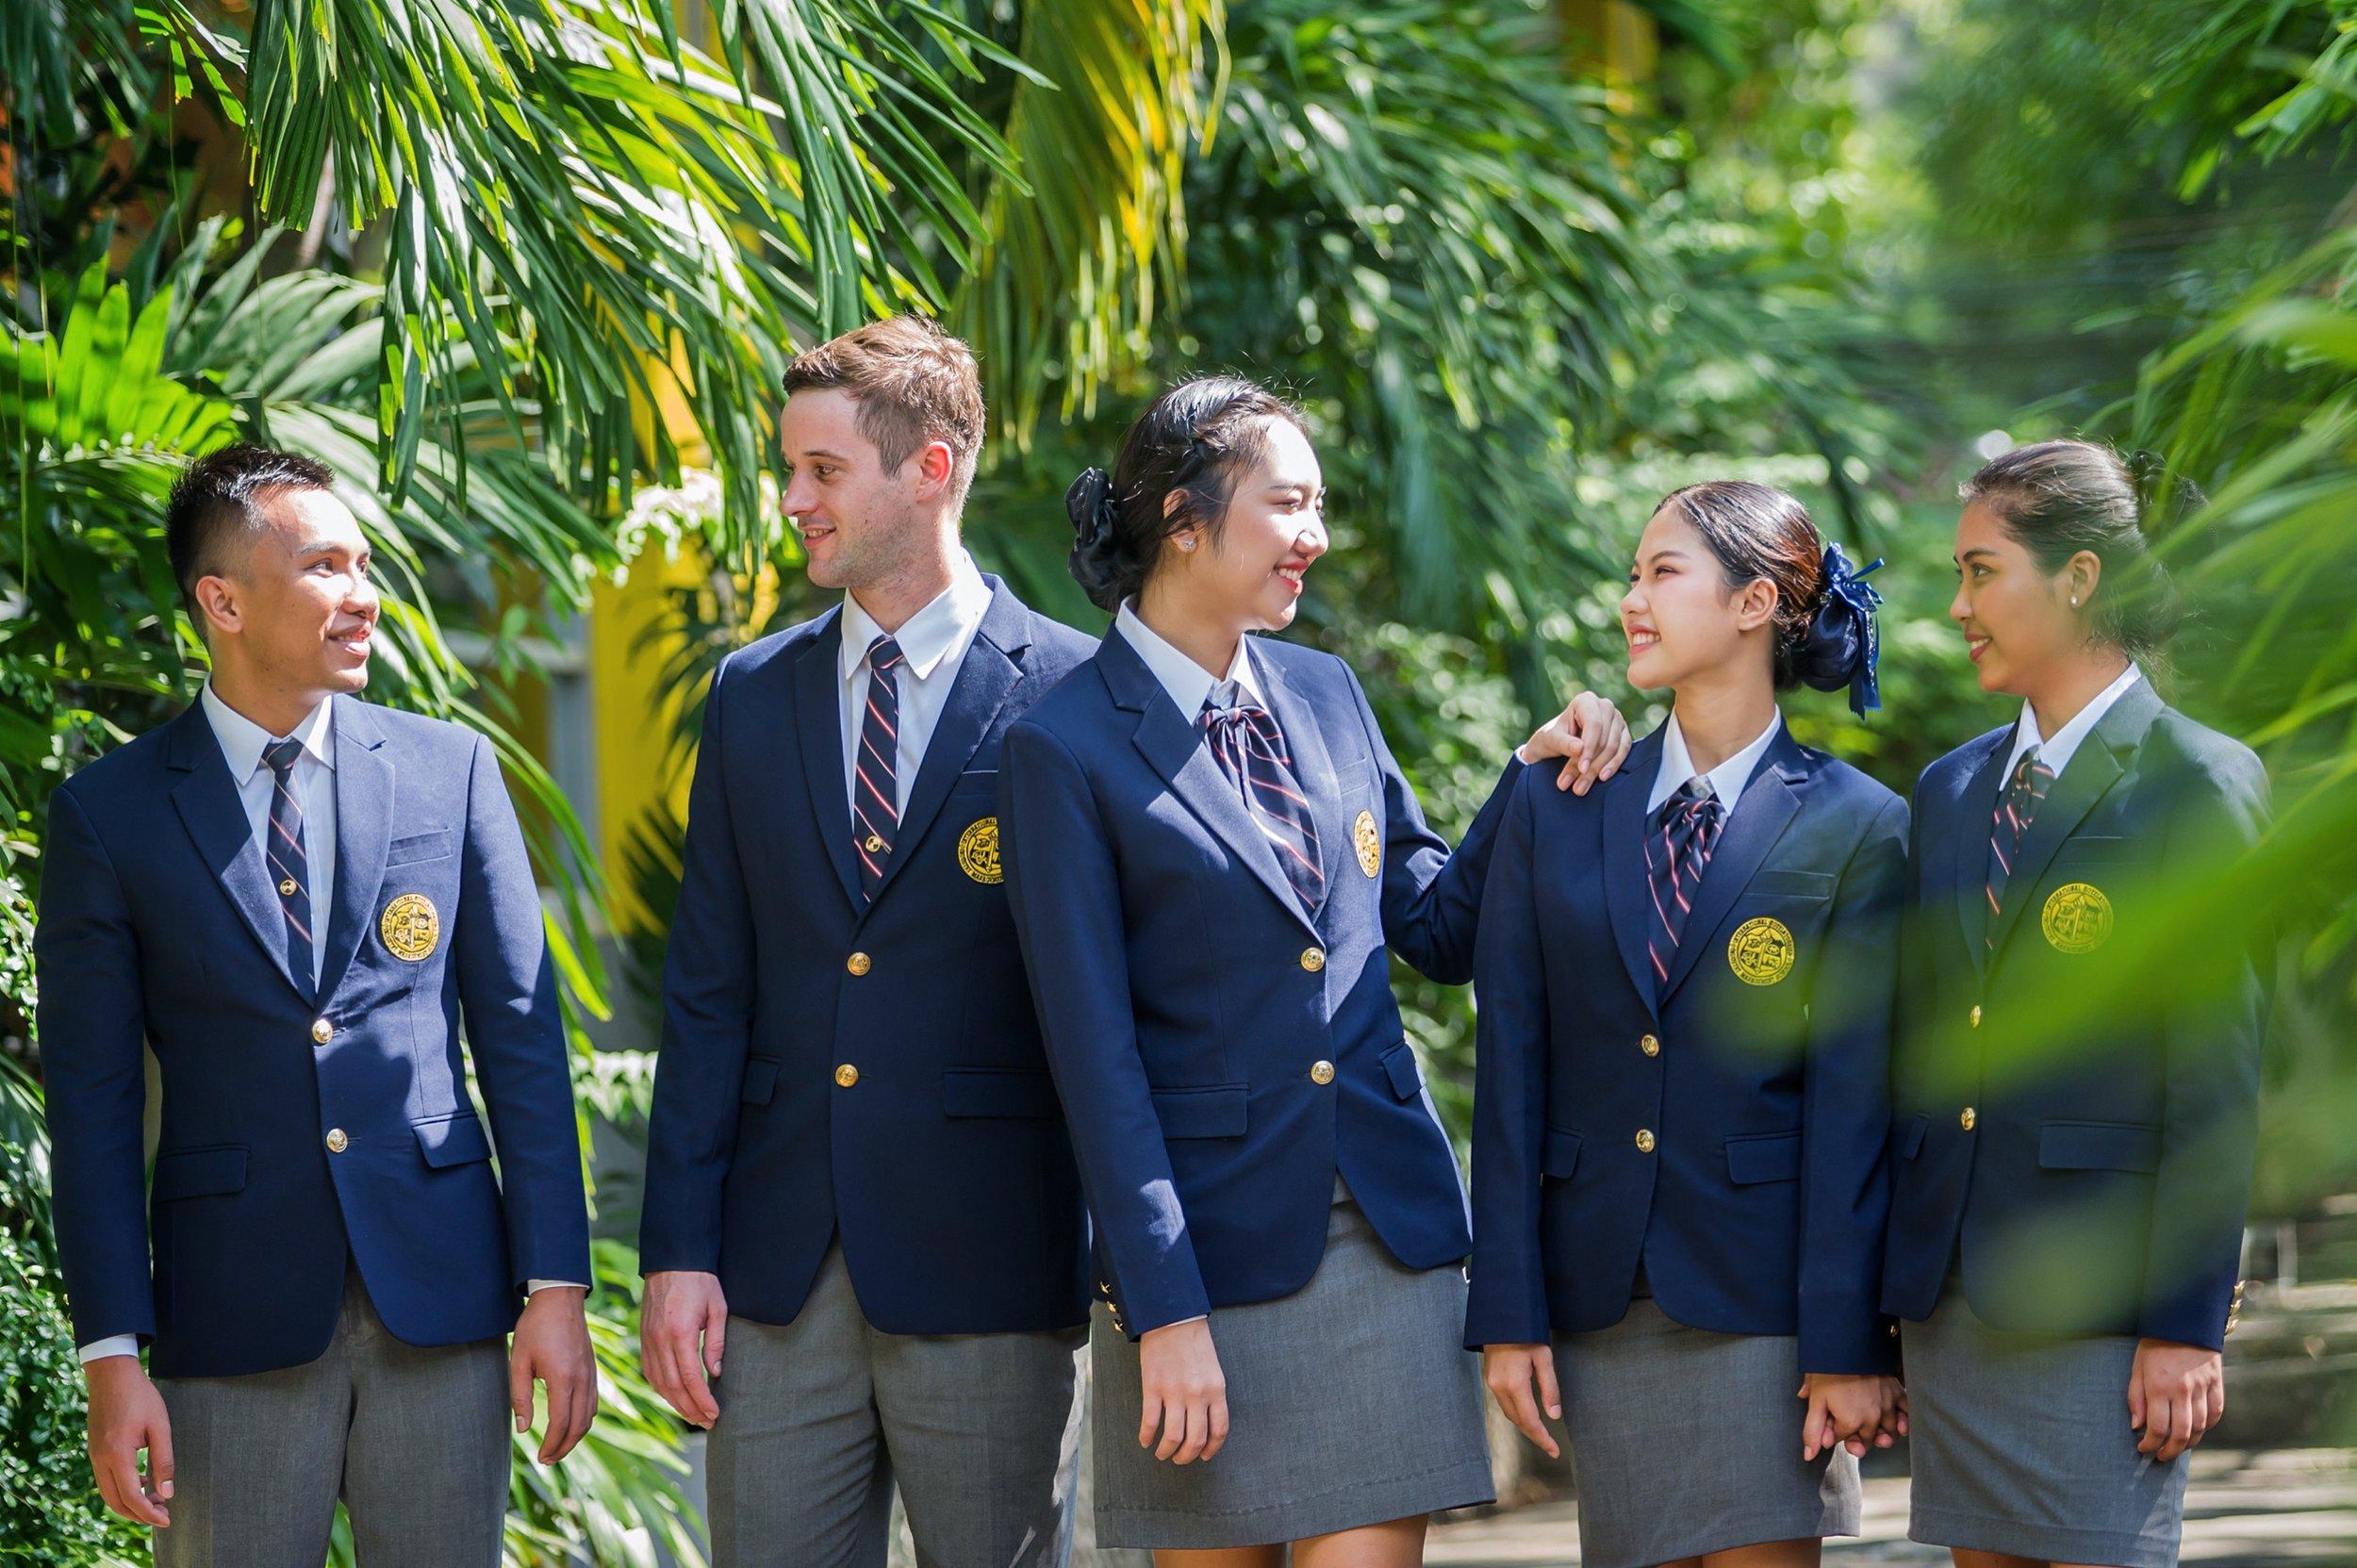 …. Students enjoying a sunny day on our campus in Bangkok .. นักศึกษาสนุกสนานกับการเรียนที่ไอทิม กรุงเทพ ….